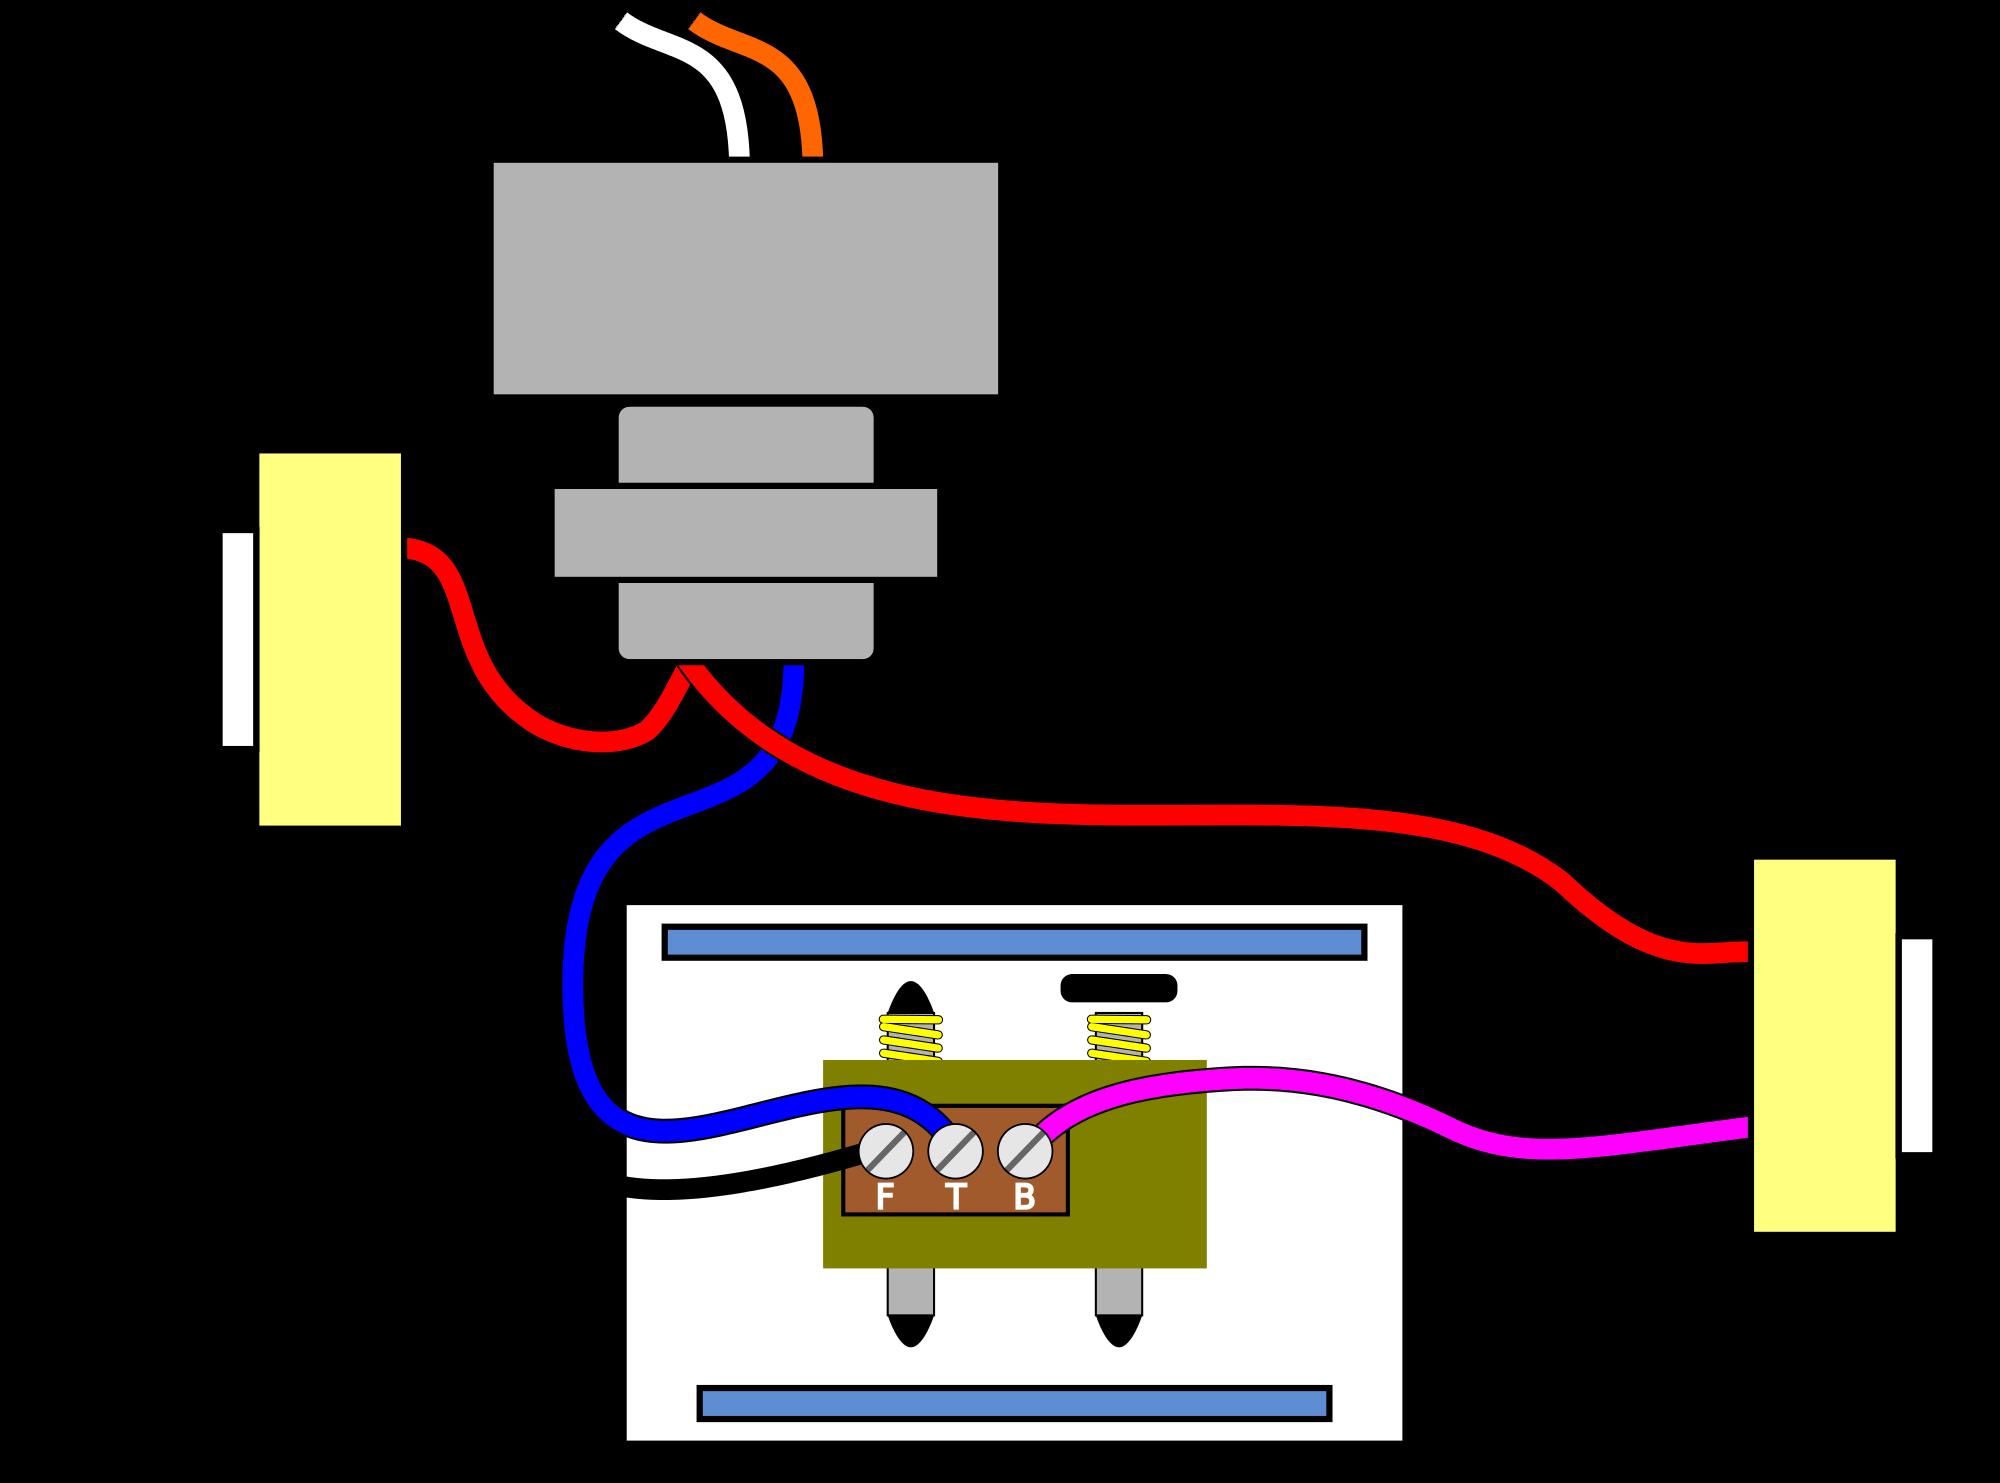 doorbell wiring pictorial diagram eee electrical projects rh pinterest ca Wired Doorbell Chimes Doorbell Wire Connection Diagram